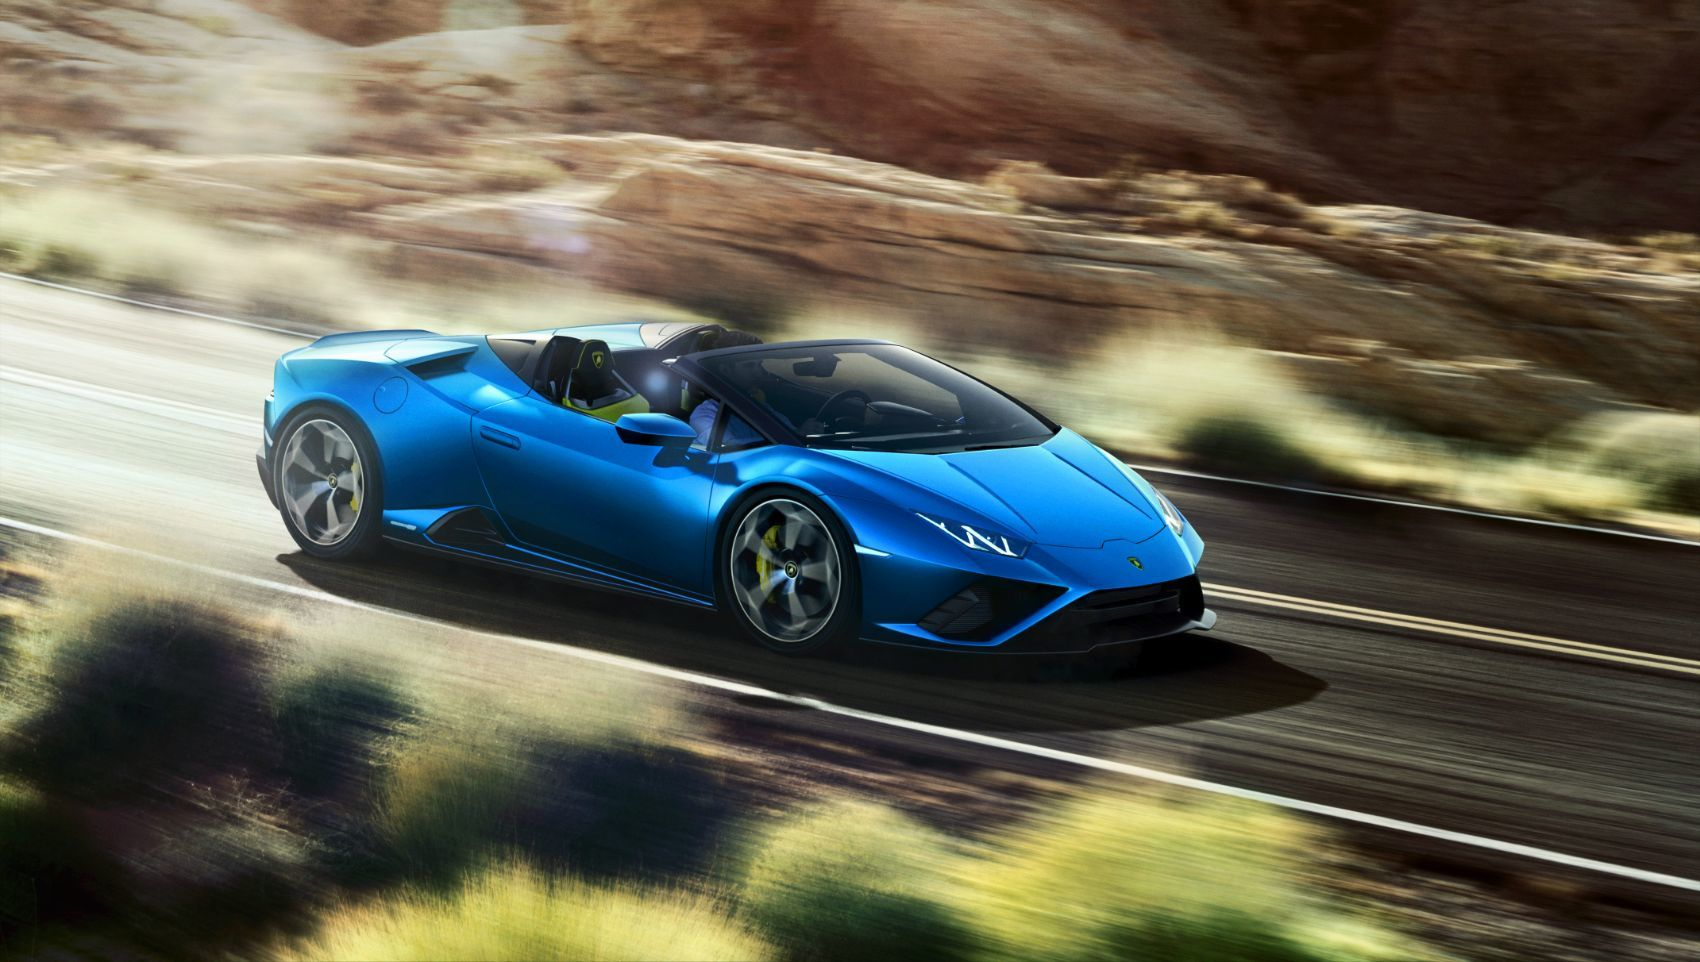 Lamborghini Huracán EVO RWD Spyder: Long Name for a Quick Car!